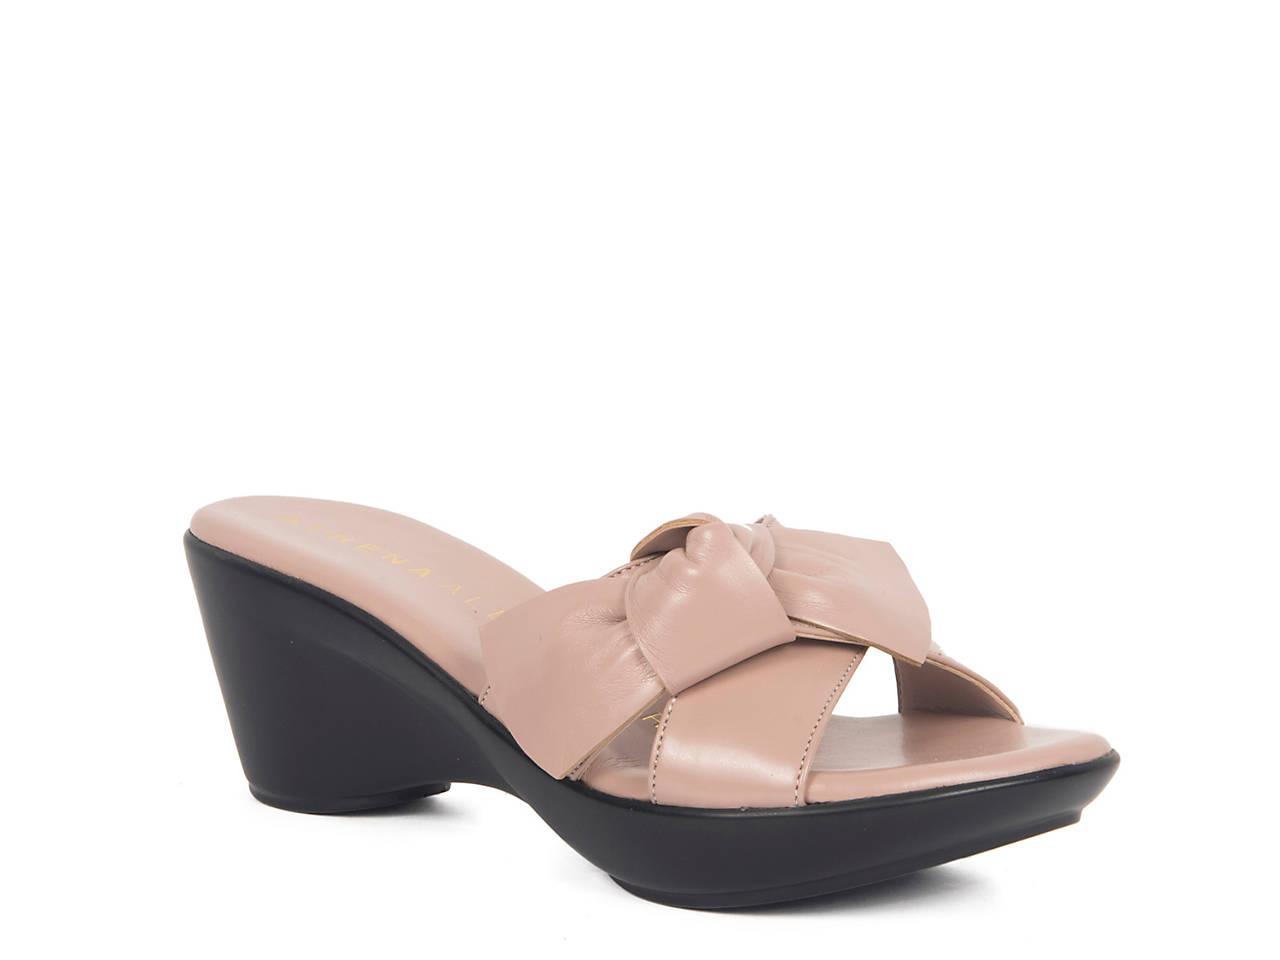 ATHENA Women's Giada Wedge Sandal Pb8YzKw7